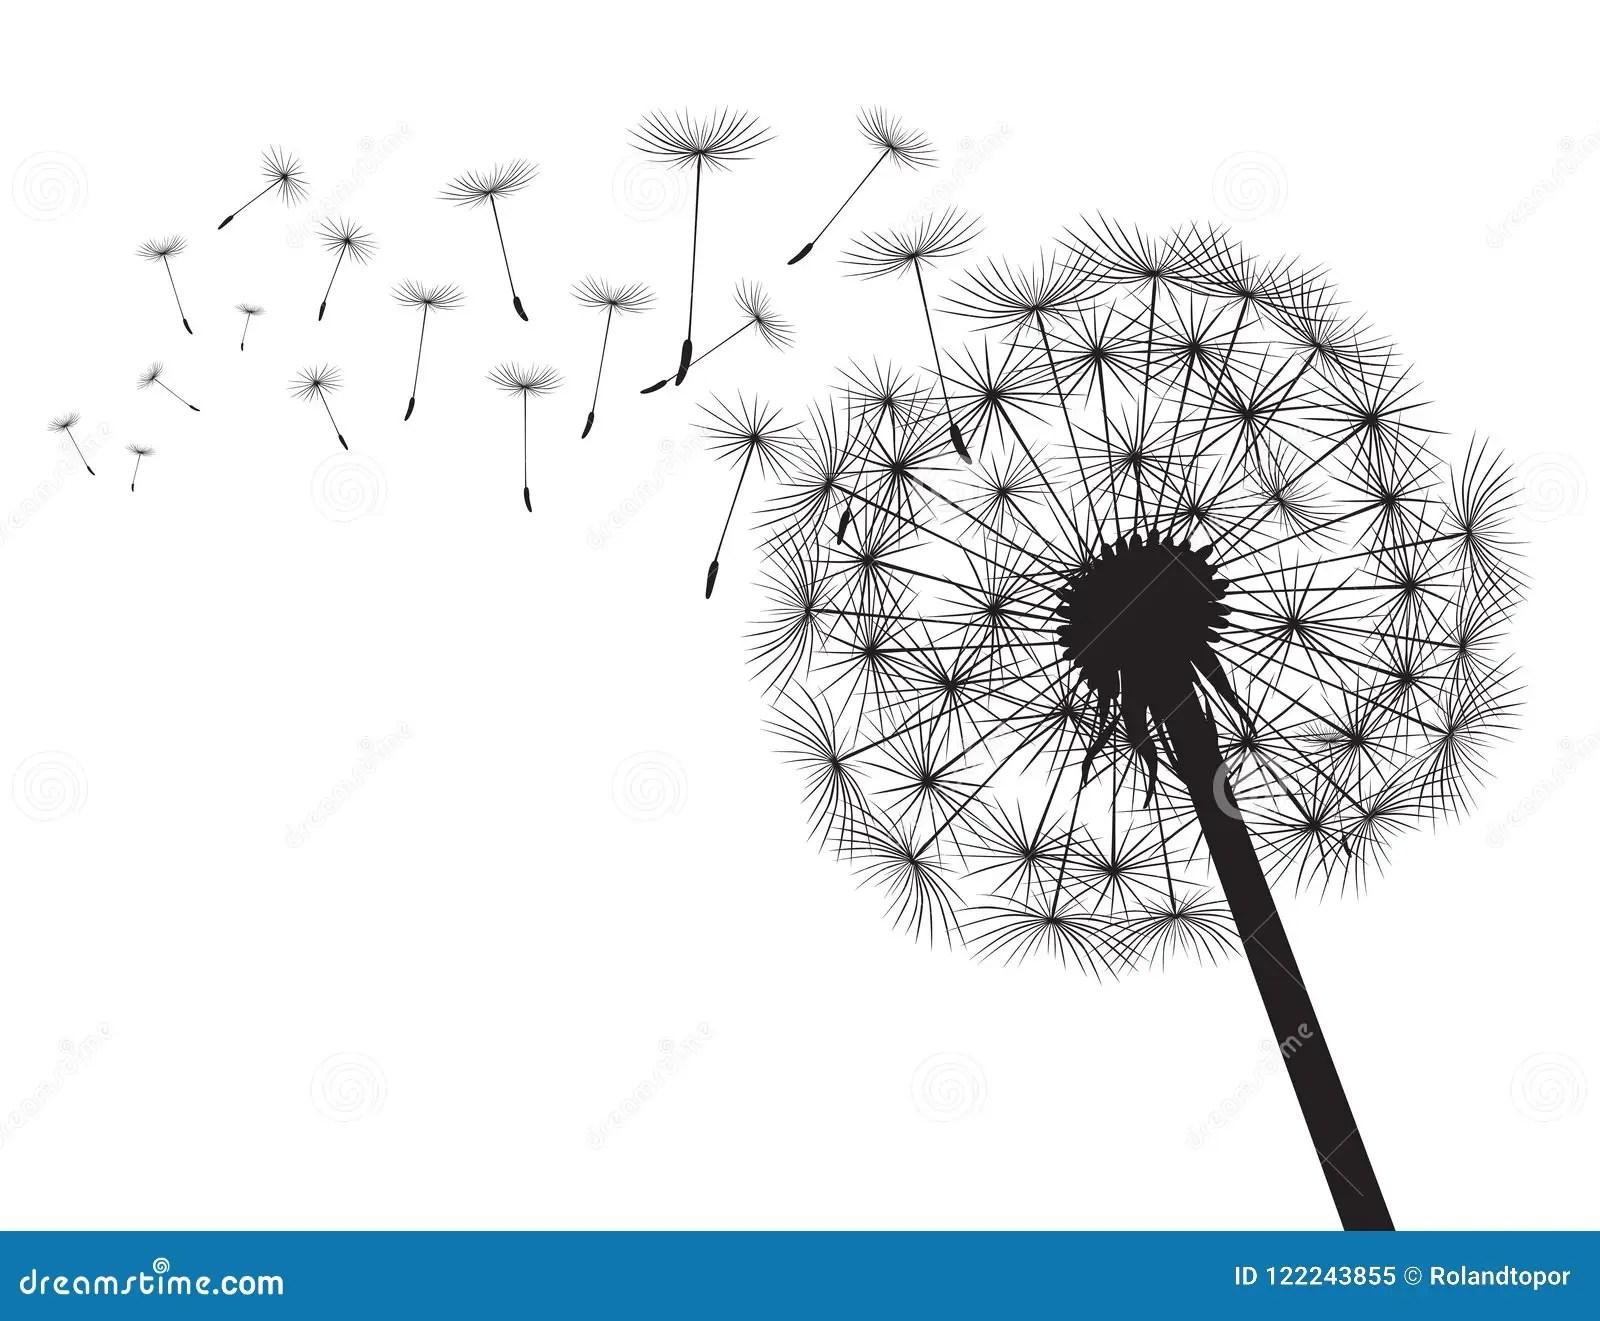 Black Silhouette Dandelions Vector Illustration Stock